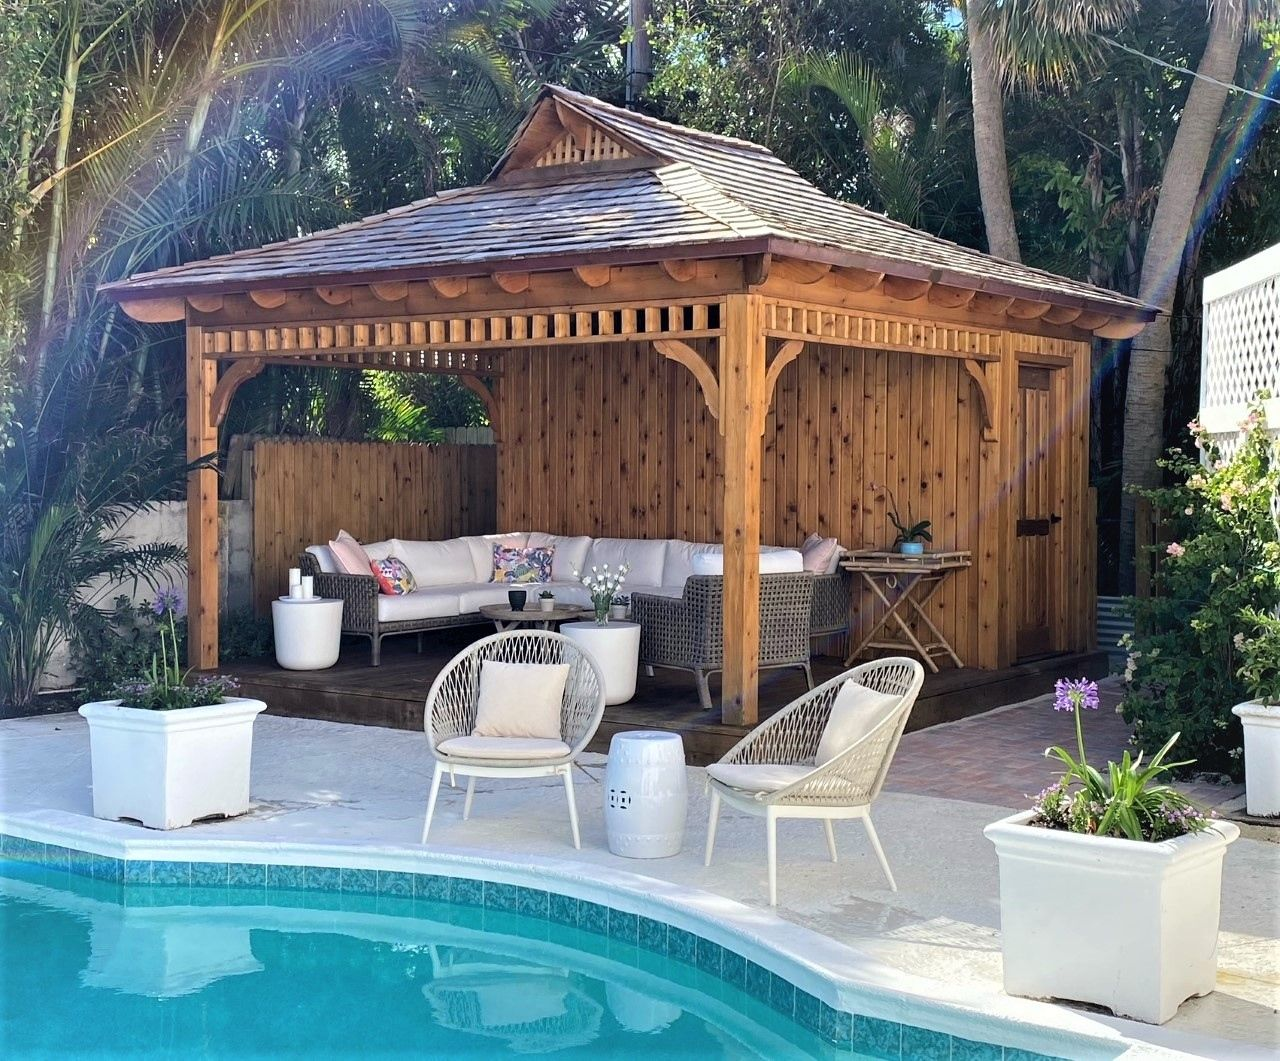 Bali Tea House Pool Cabana In 2021 Pool Houses Tea House Backyard Backyard pool house bar ideas